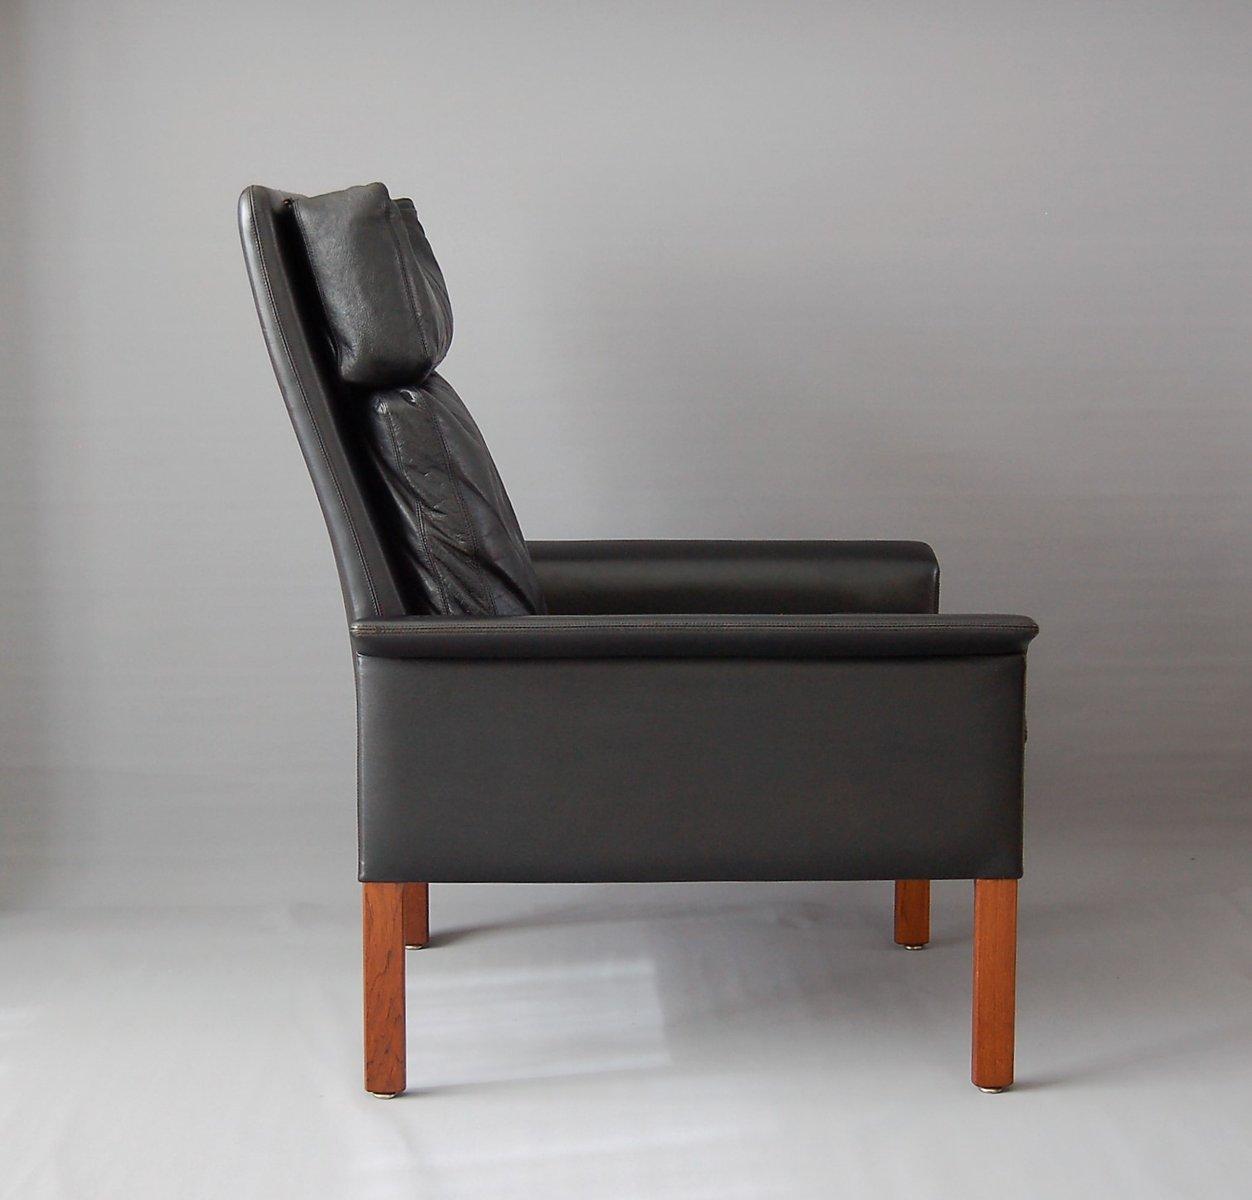 Captivating Vintage Black Leather Armchair By Hans Olsen For CS Mobelfabrik